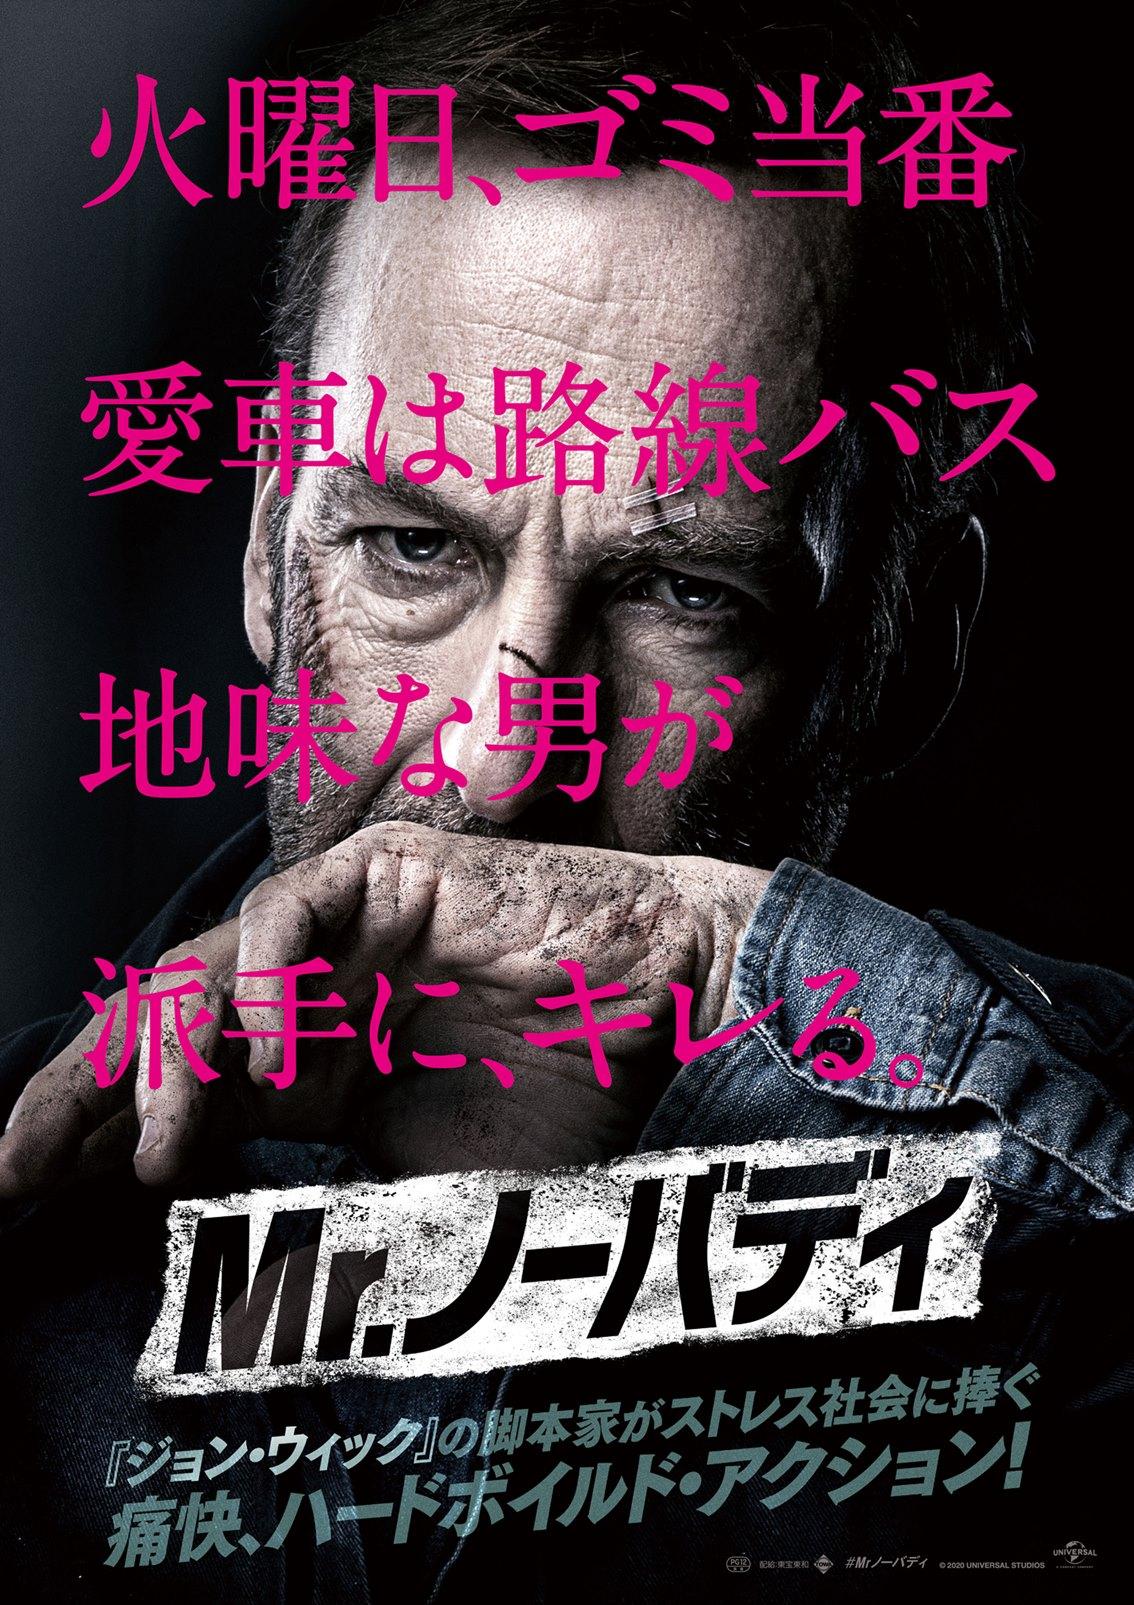 『Mrノーバディ』日本版ポスター